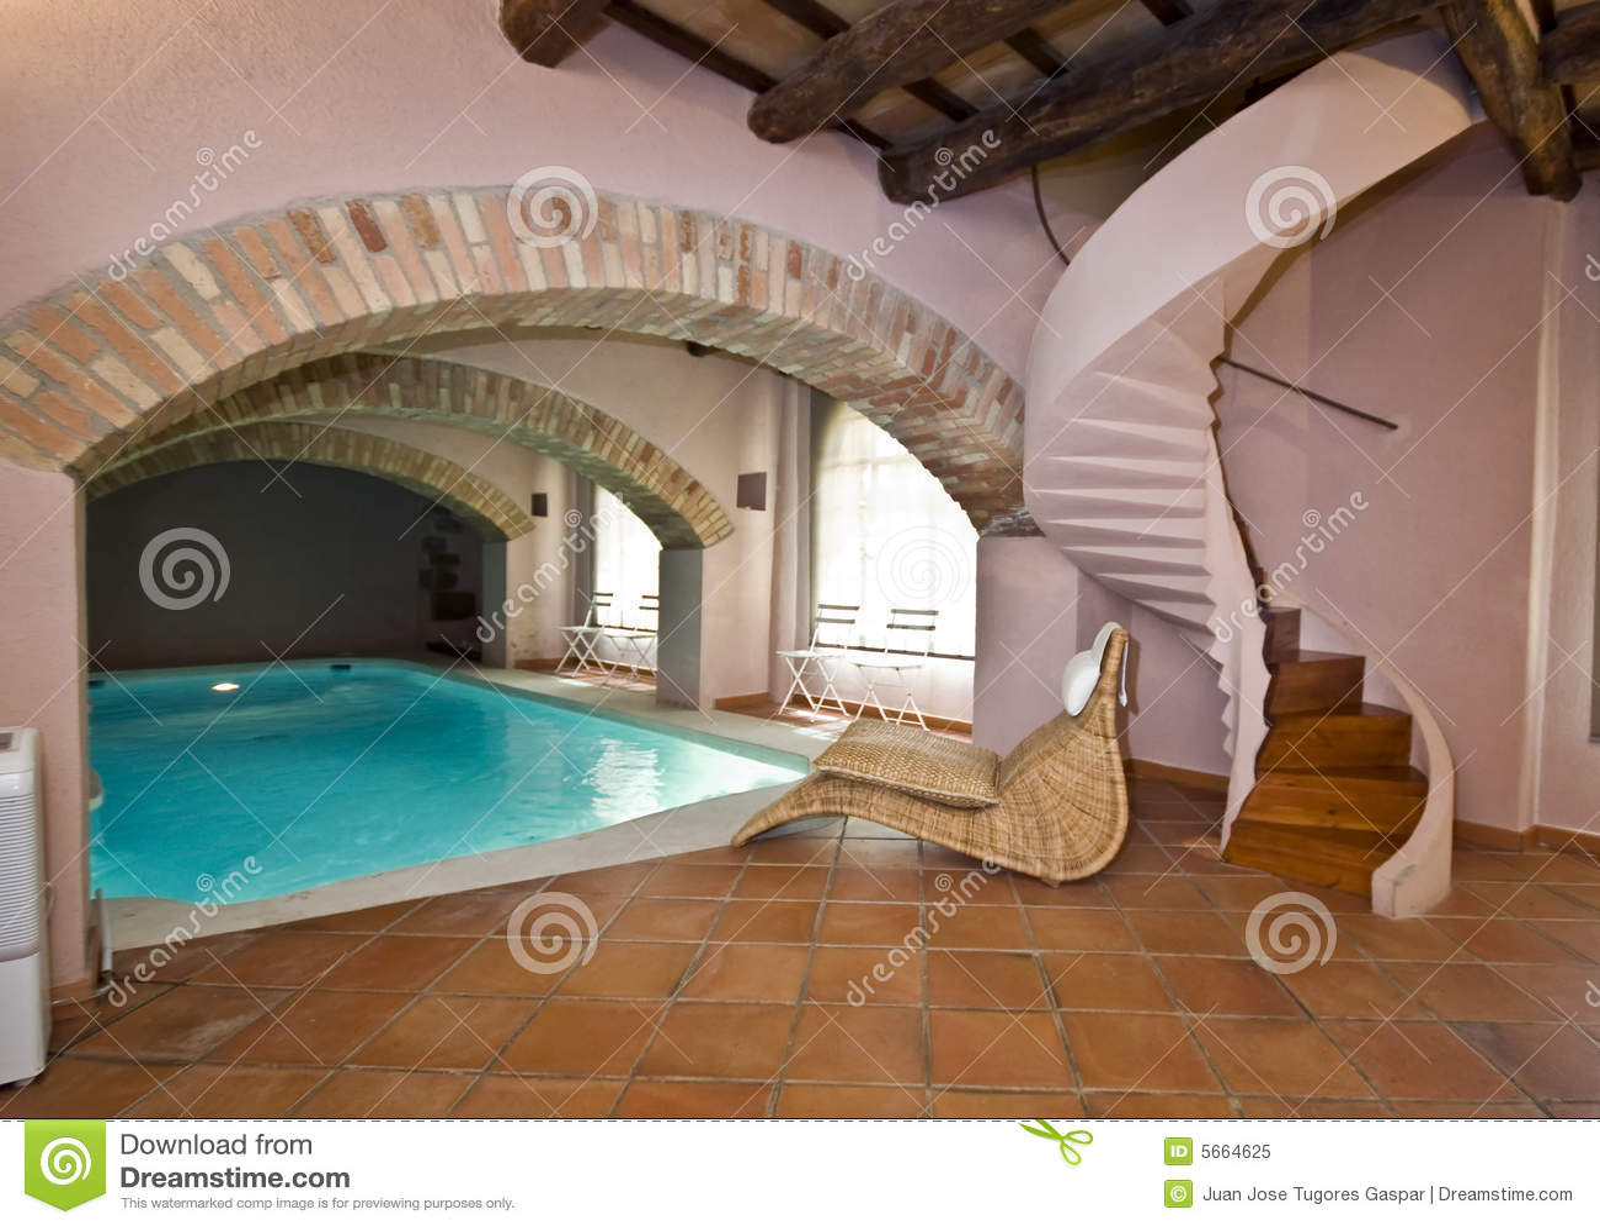 Swimming Pool Room Royalty Free Stock Photo Image 5664625